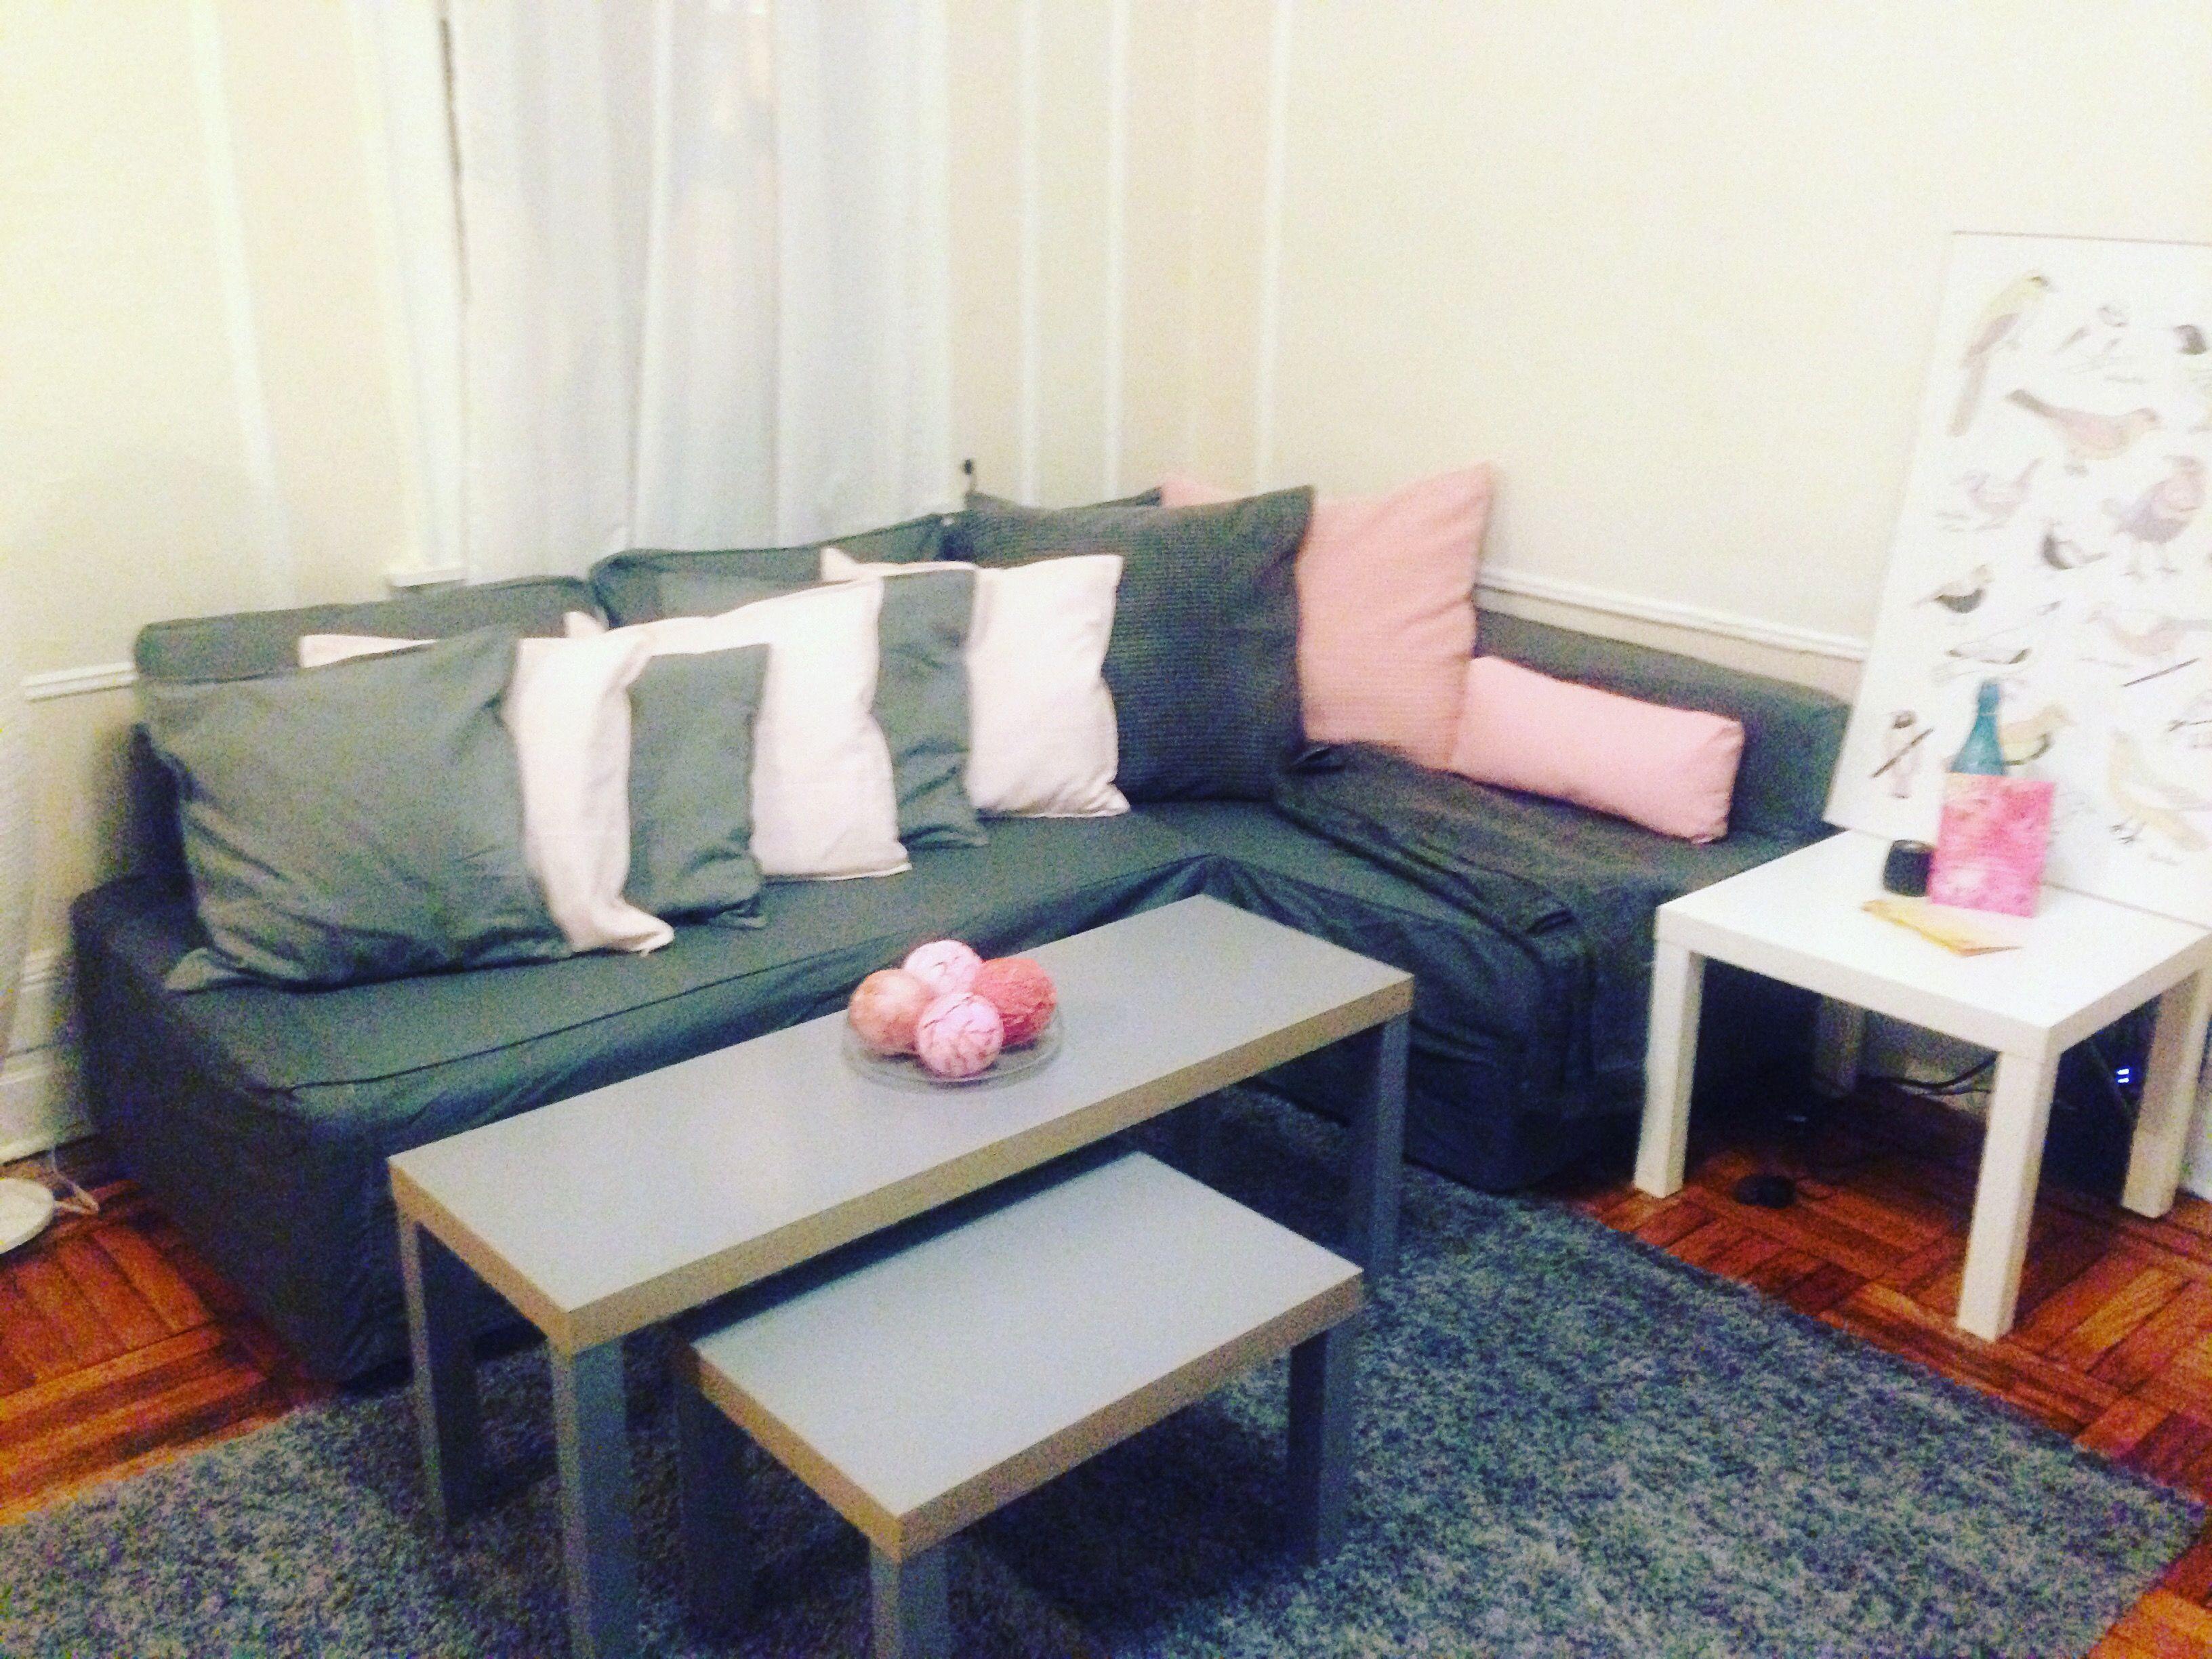 Ikea Friheten Sectional Sofa And Pillows Home Decor Ikea